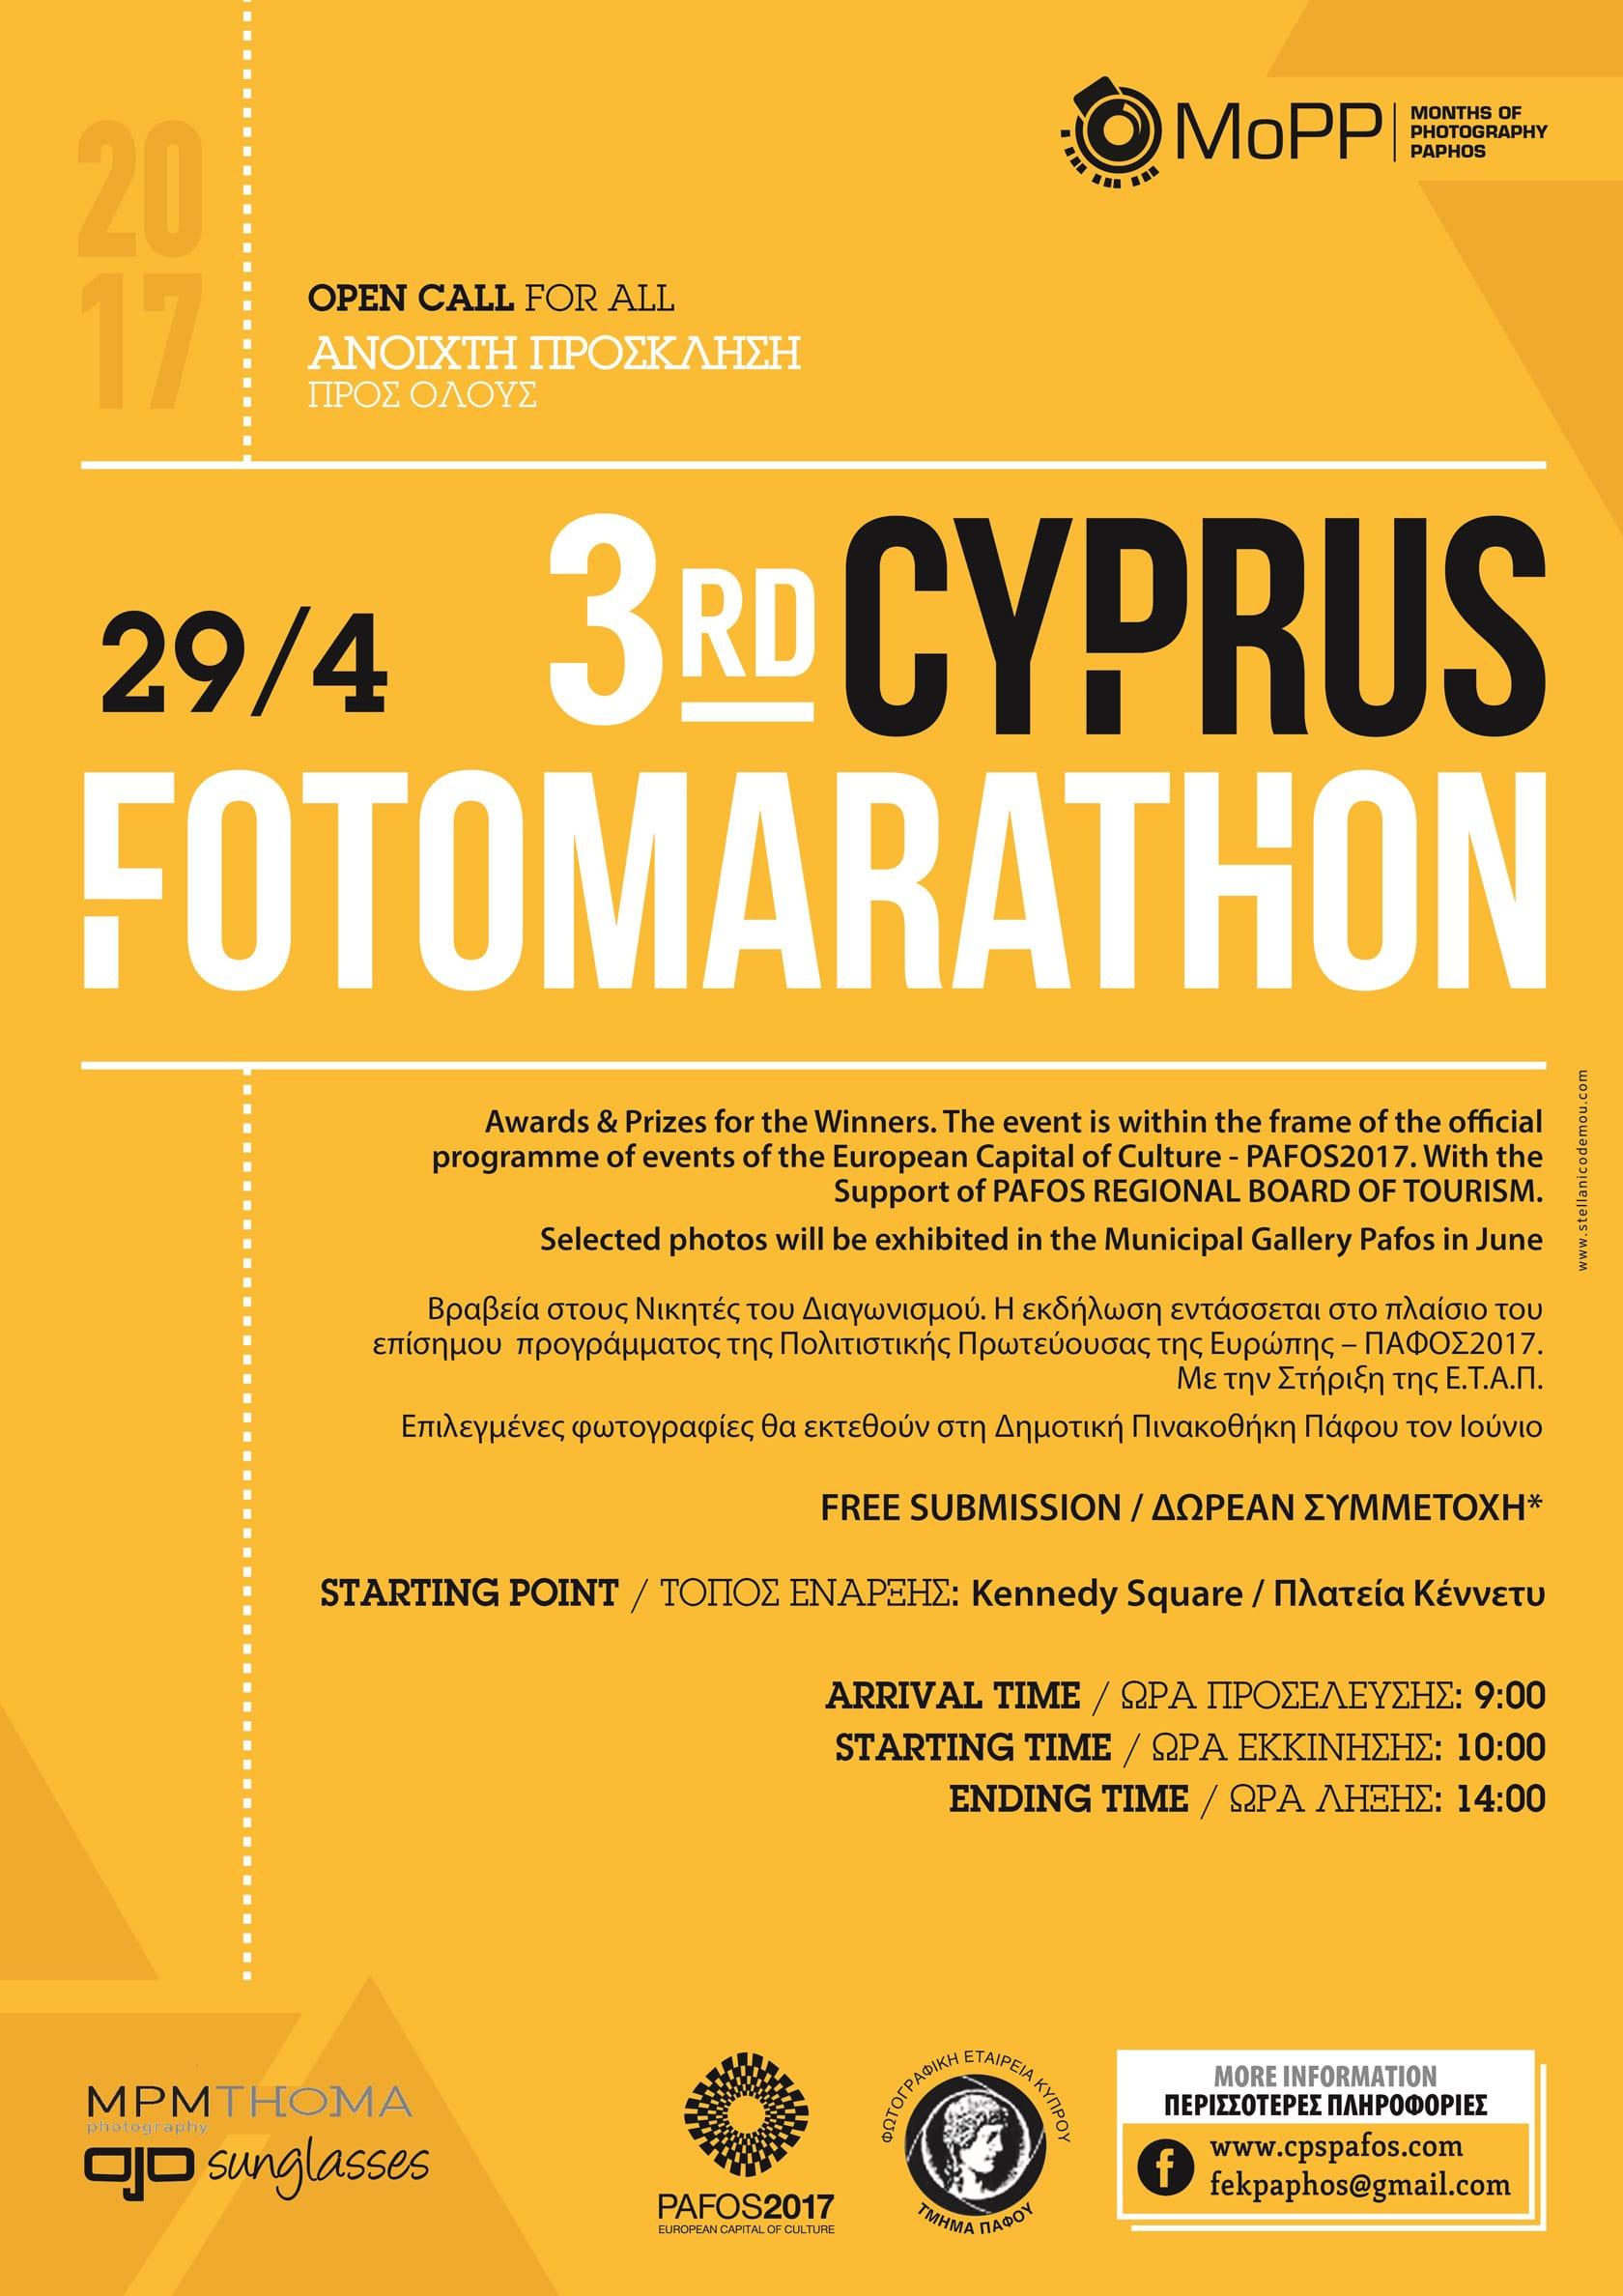 MOPP Fotomarathon 2017